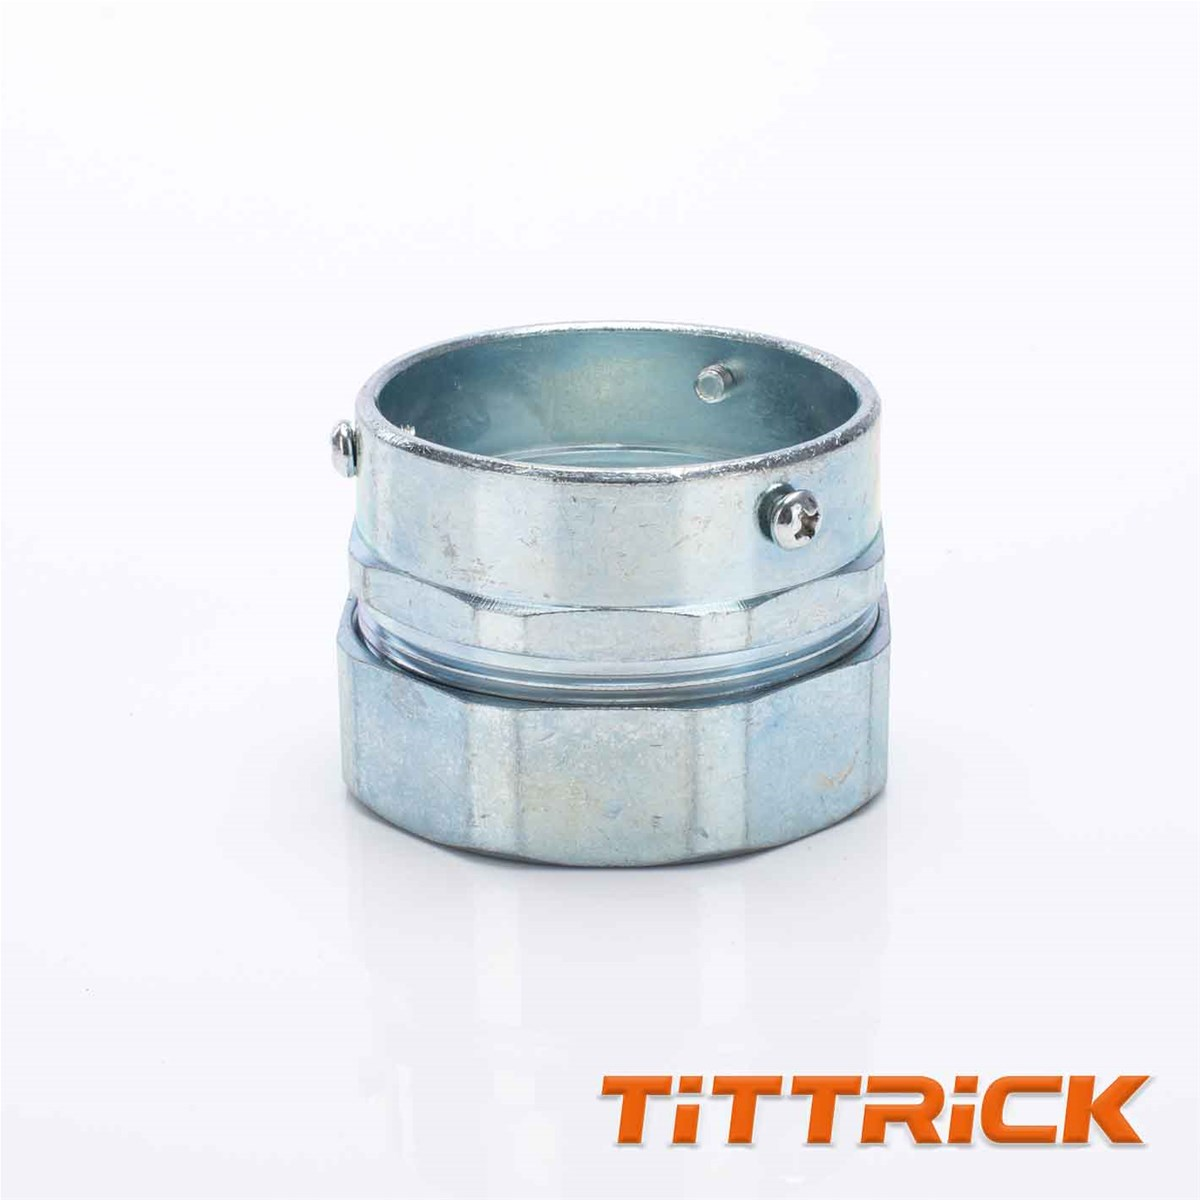 Tittrick Metal Flexible conduit Adaptor Tube Connector